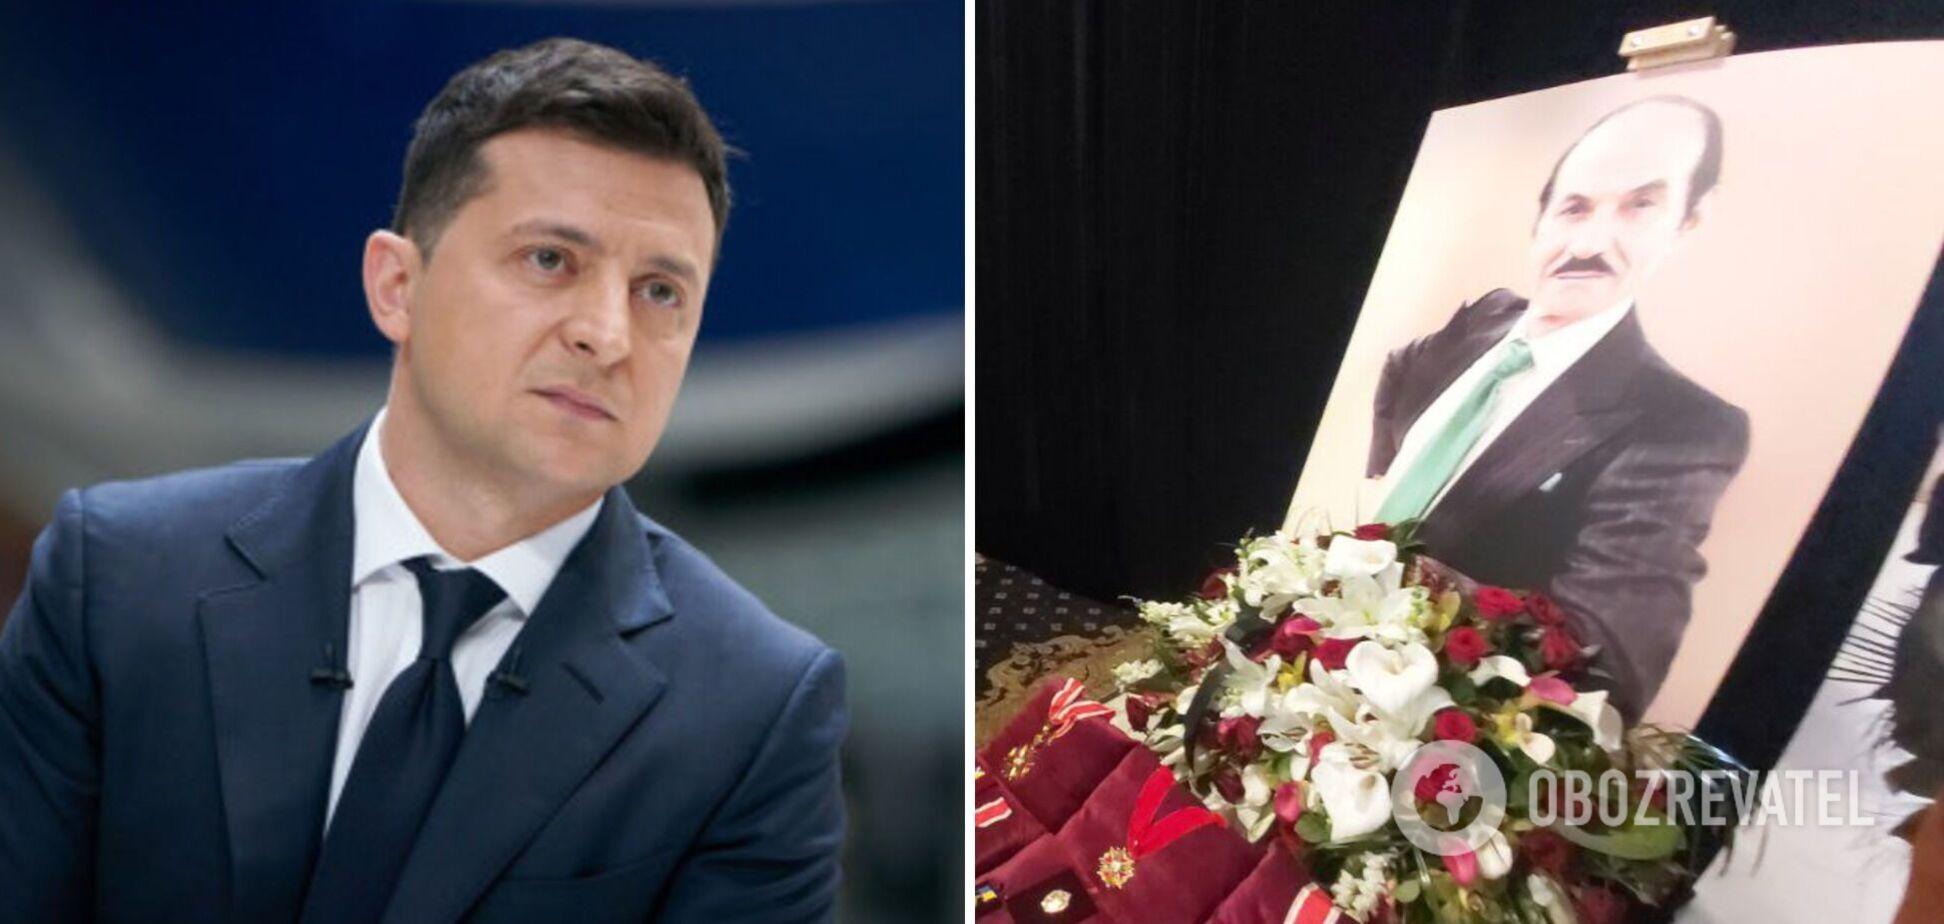 Владимир Зеленский приехал на церемонию прощания с Чапкисом. Фото